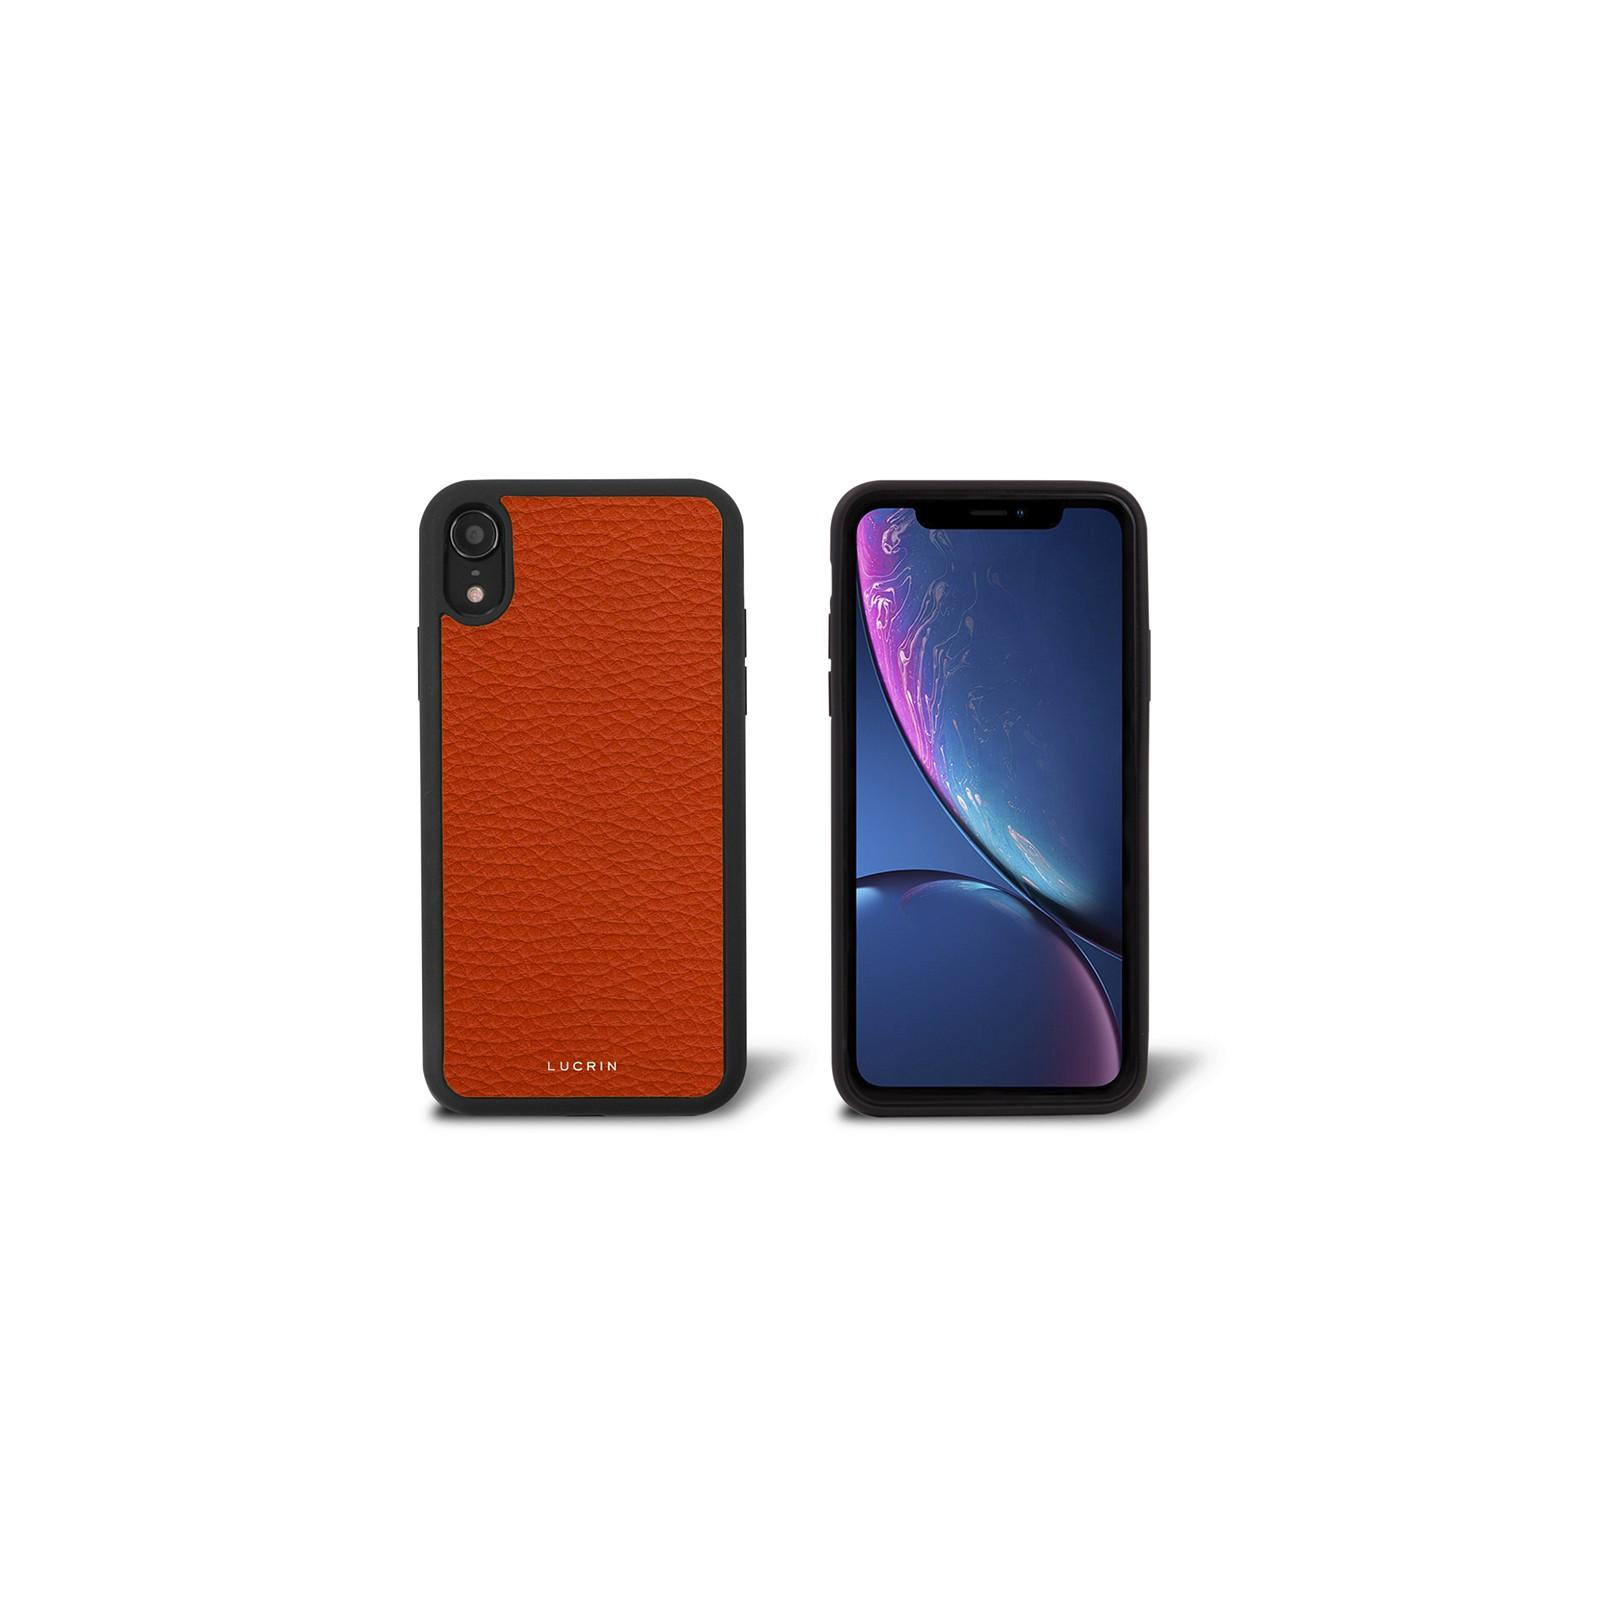 5bb73927a7e Funda para iPhone XR Naranja - Piel Grano Funda para iPhone XR Naranja -  Piel Grano 